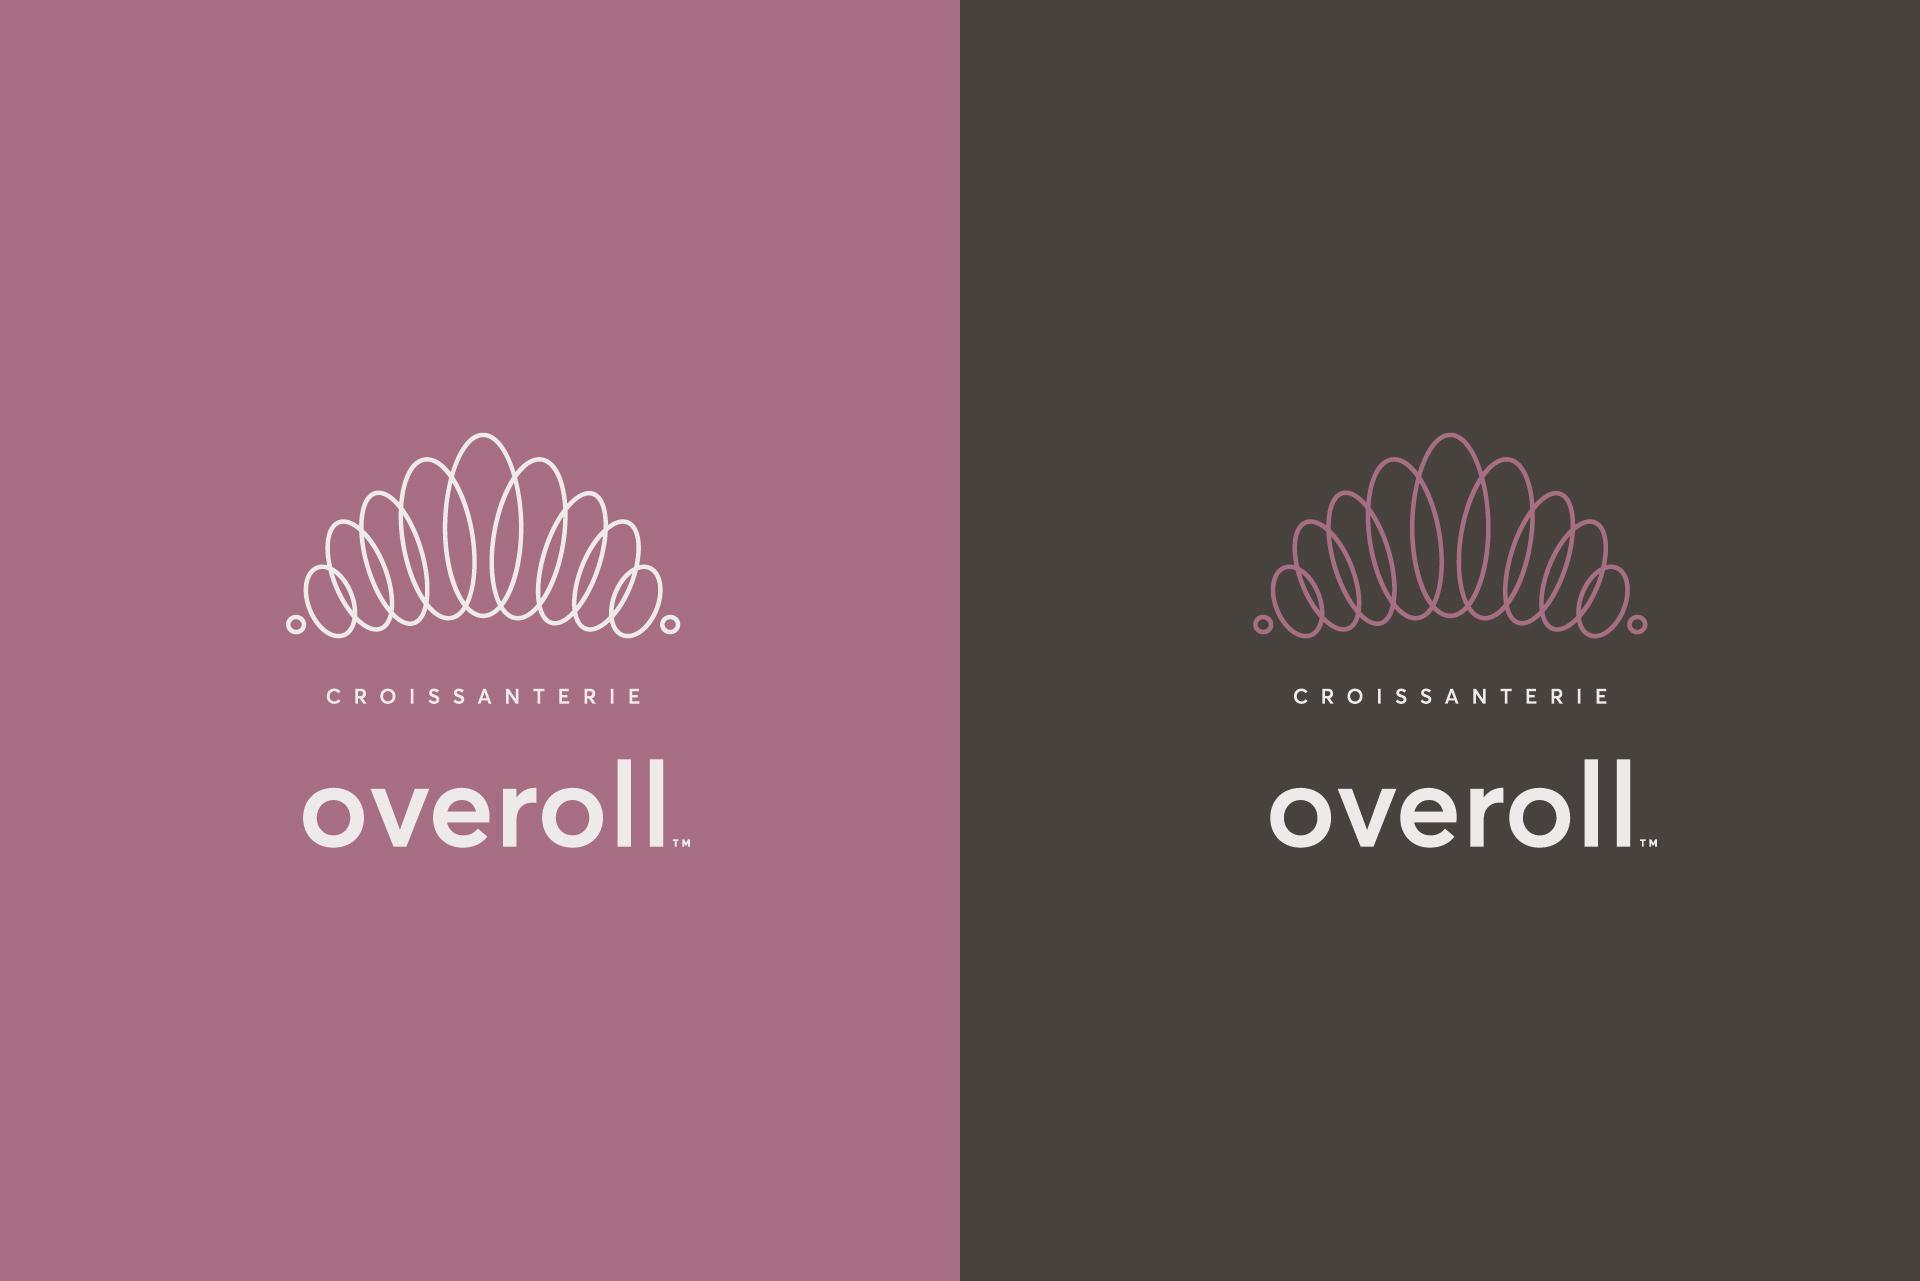 overoll-evge-11.jpg